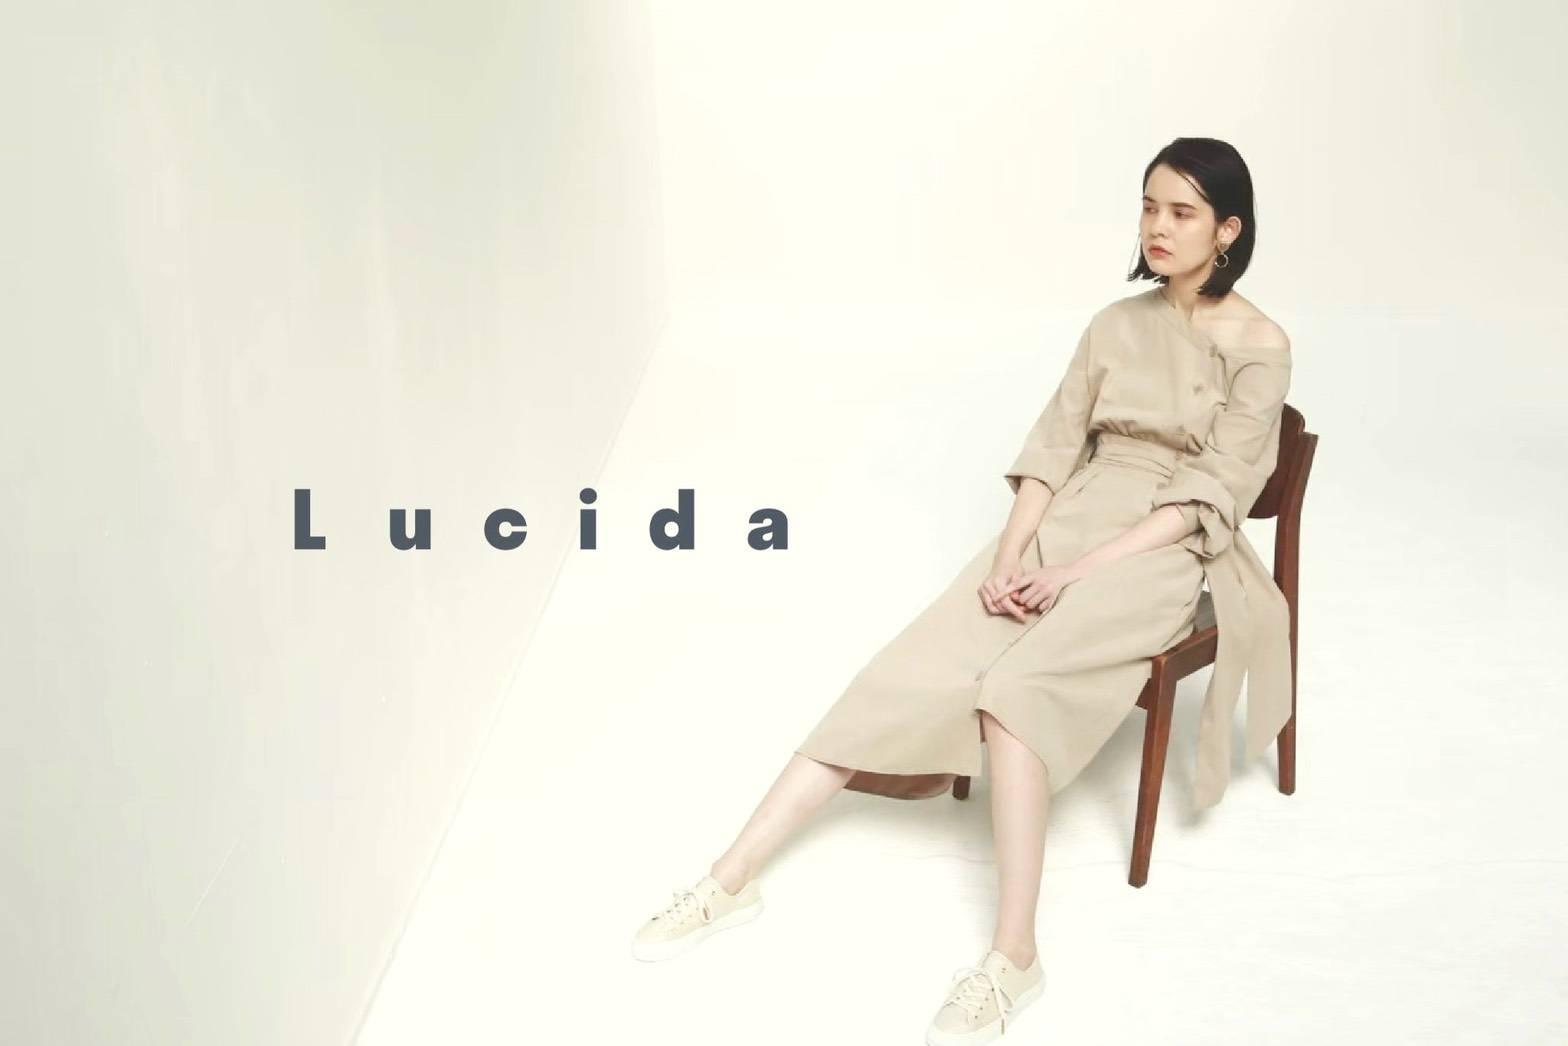 Lucida(ルシーダ) 株式会社スタークレア